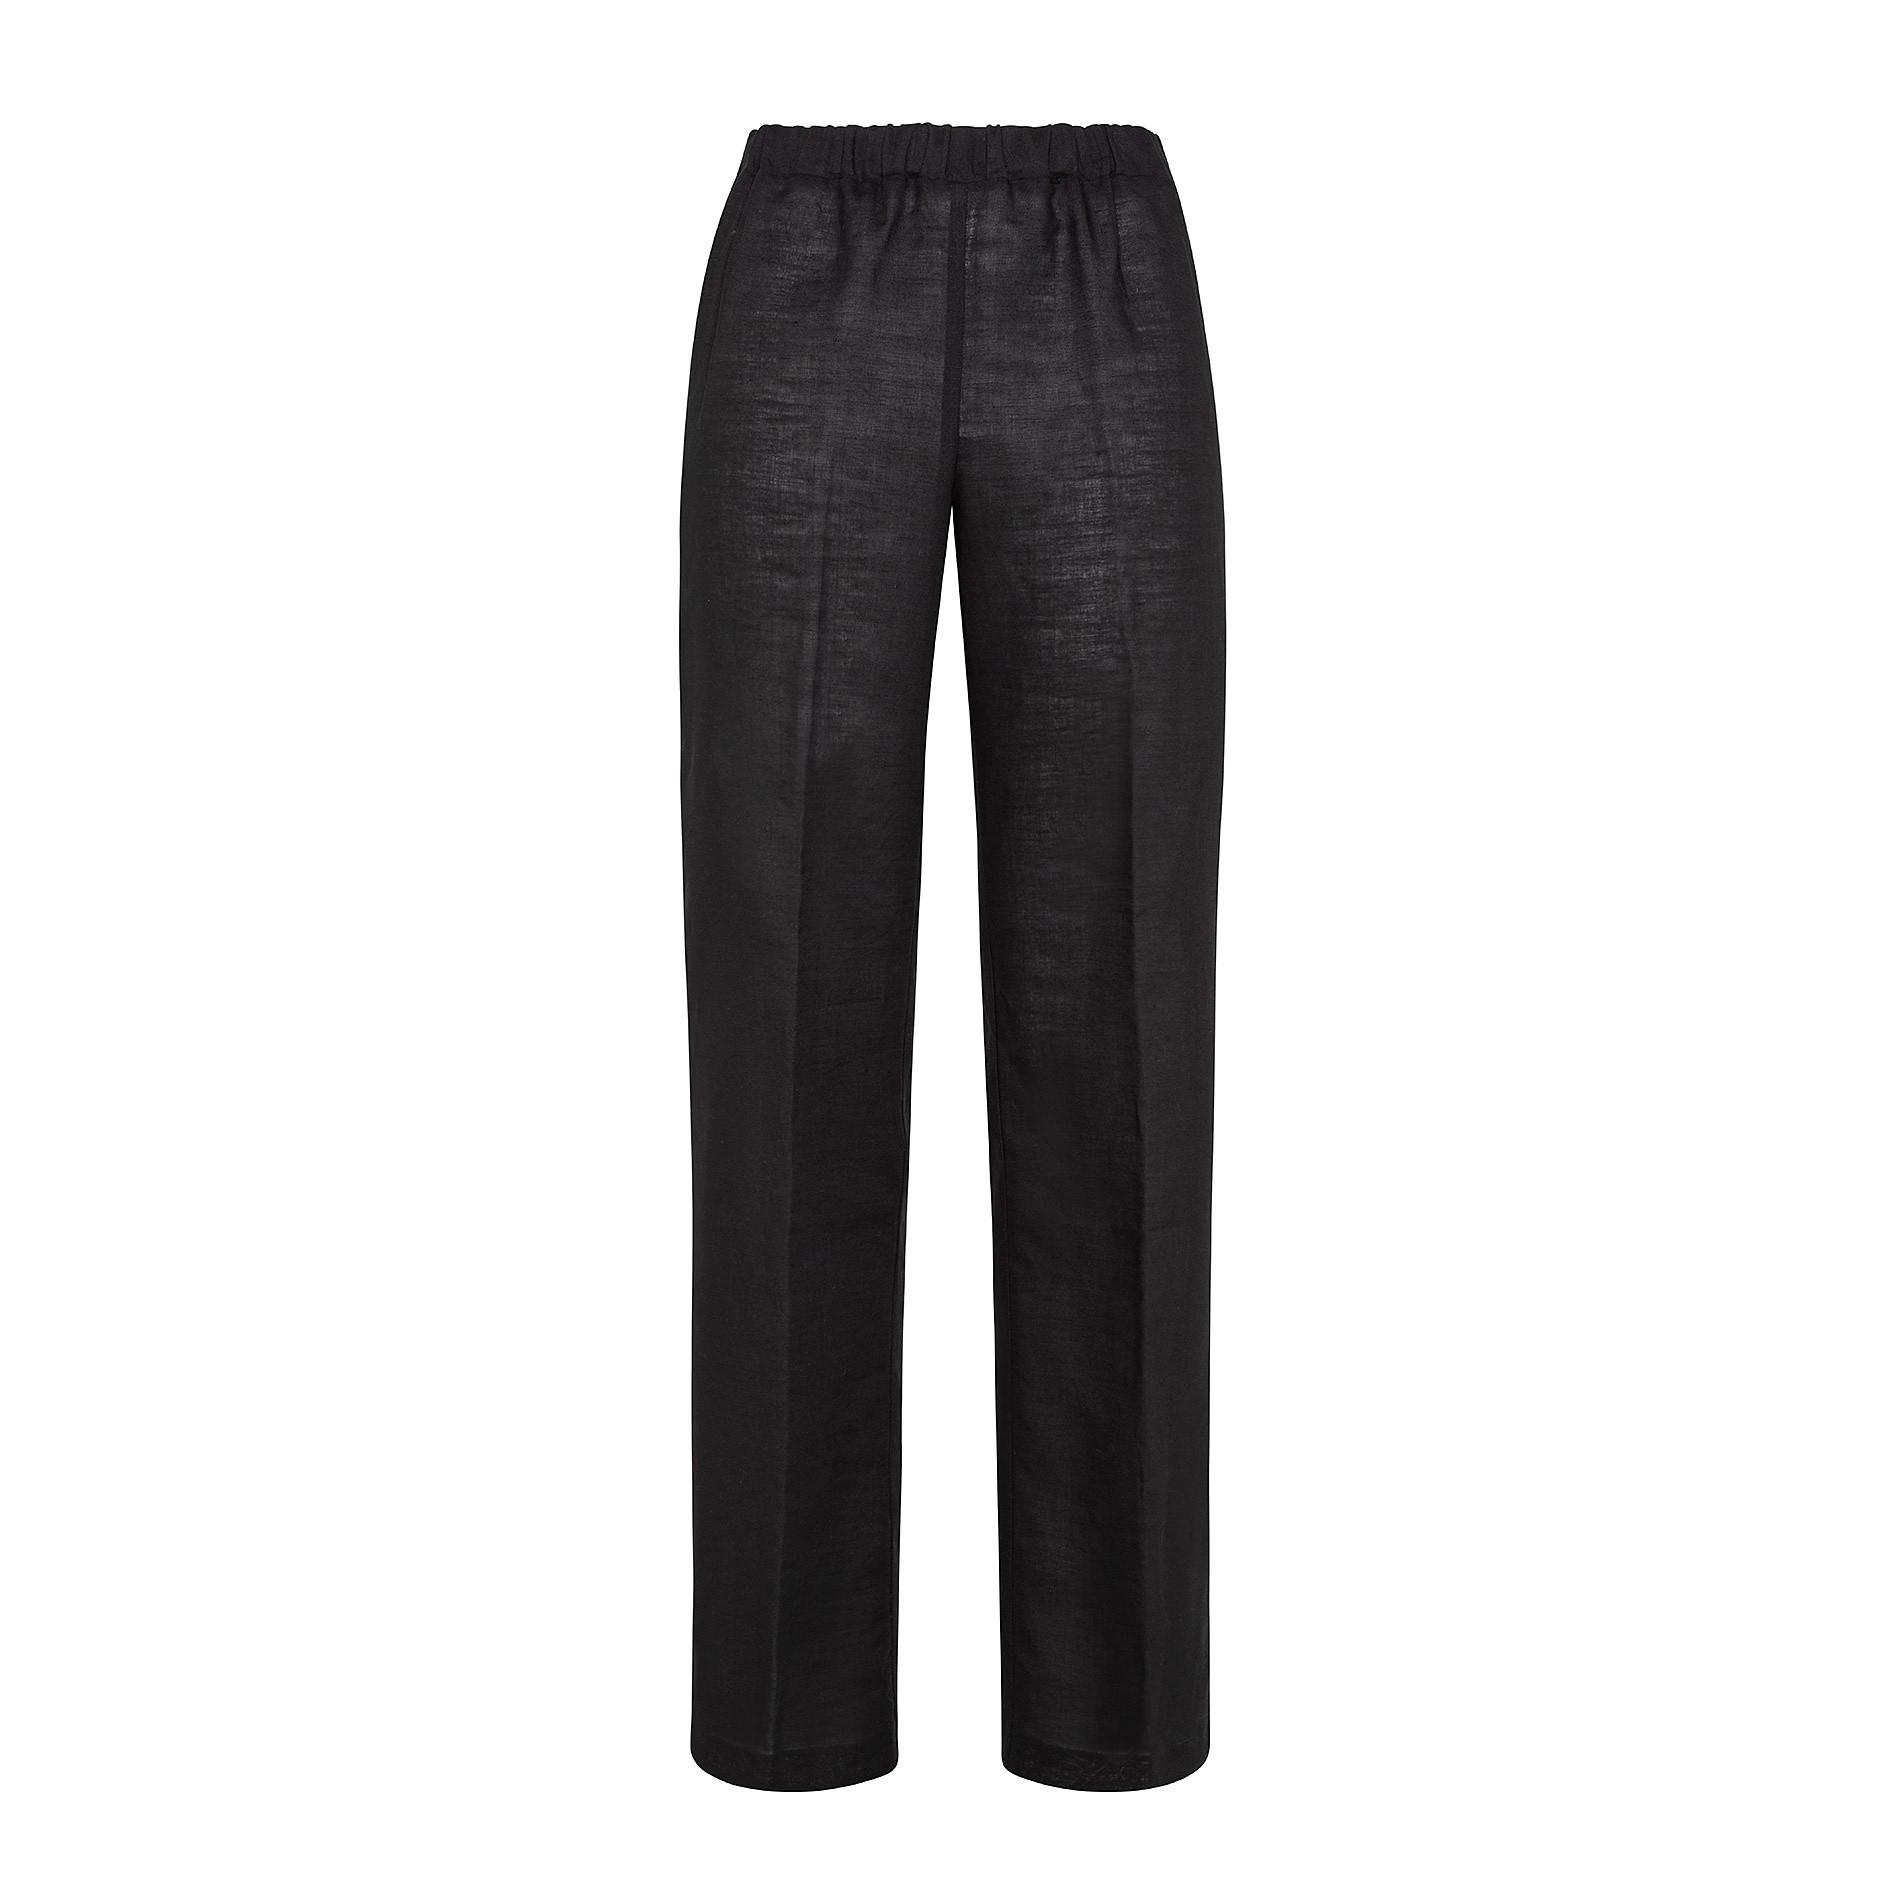 Pantalone misto lino con elastico Koan, Nero, large image number 0